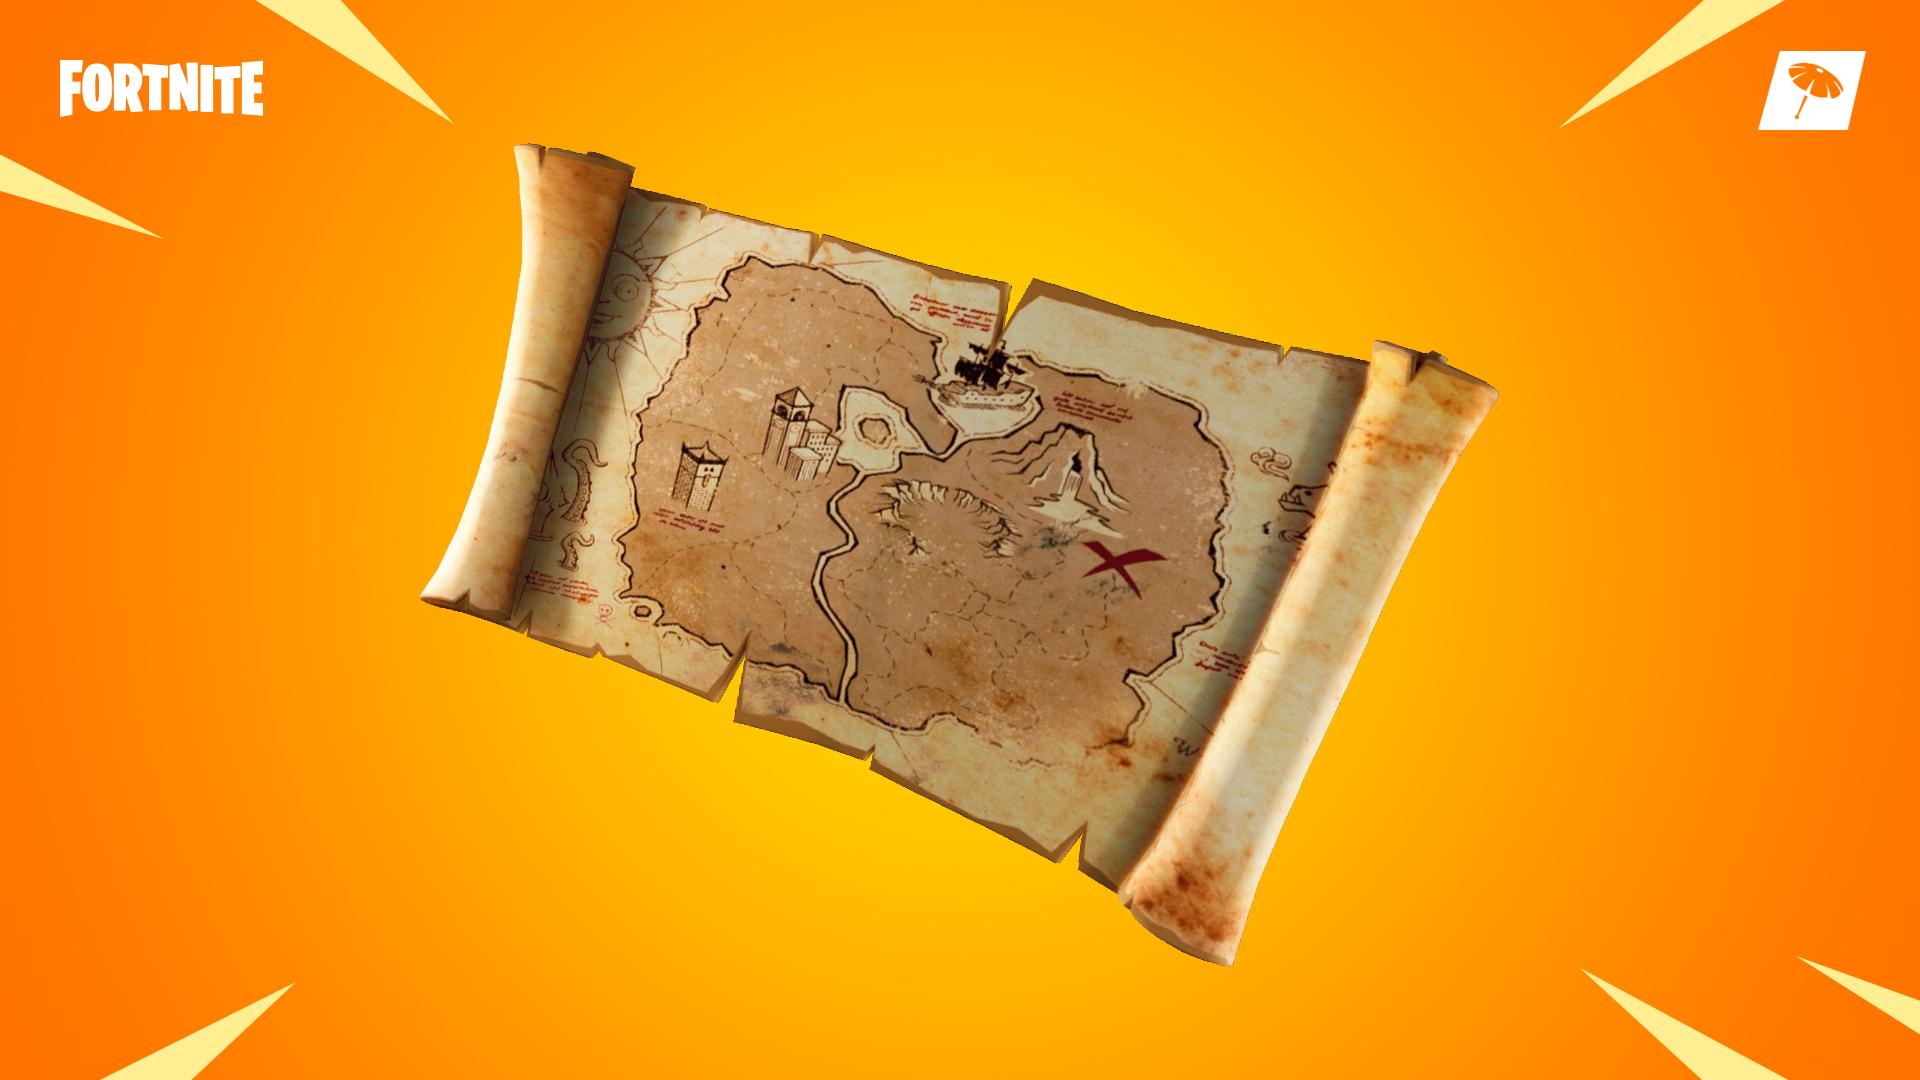 fortnite search where the magnifying glass sits on the treasure map loading screen vg247 - fortnite season 8 week 3 treasure map